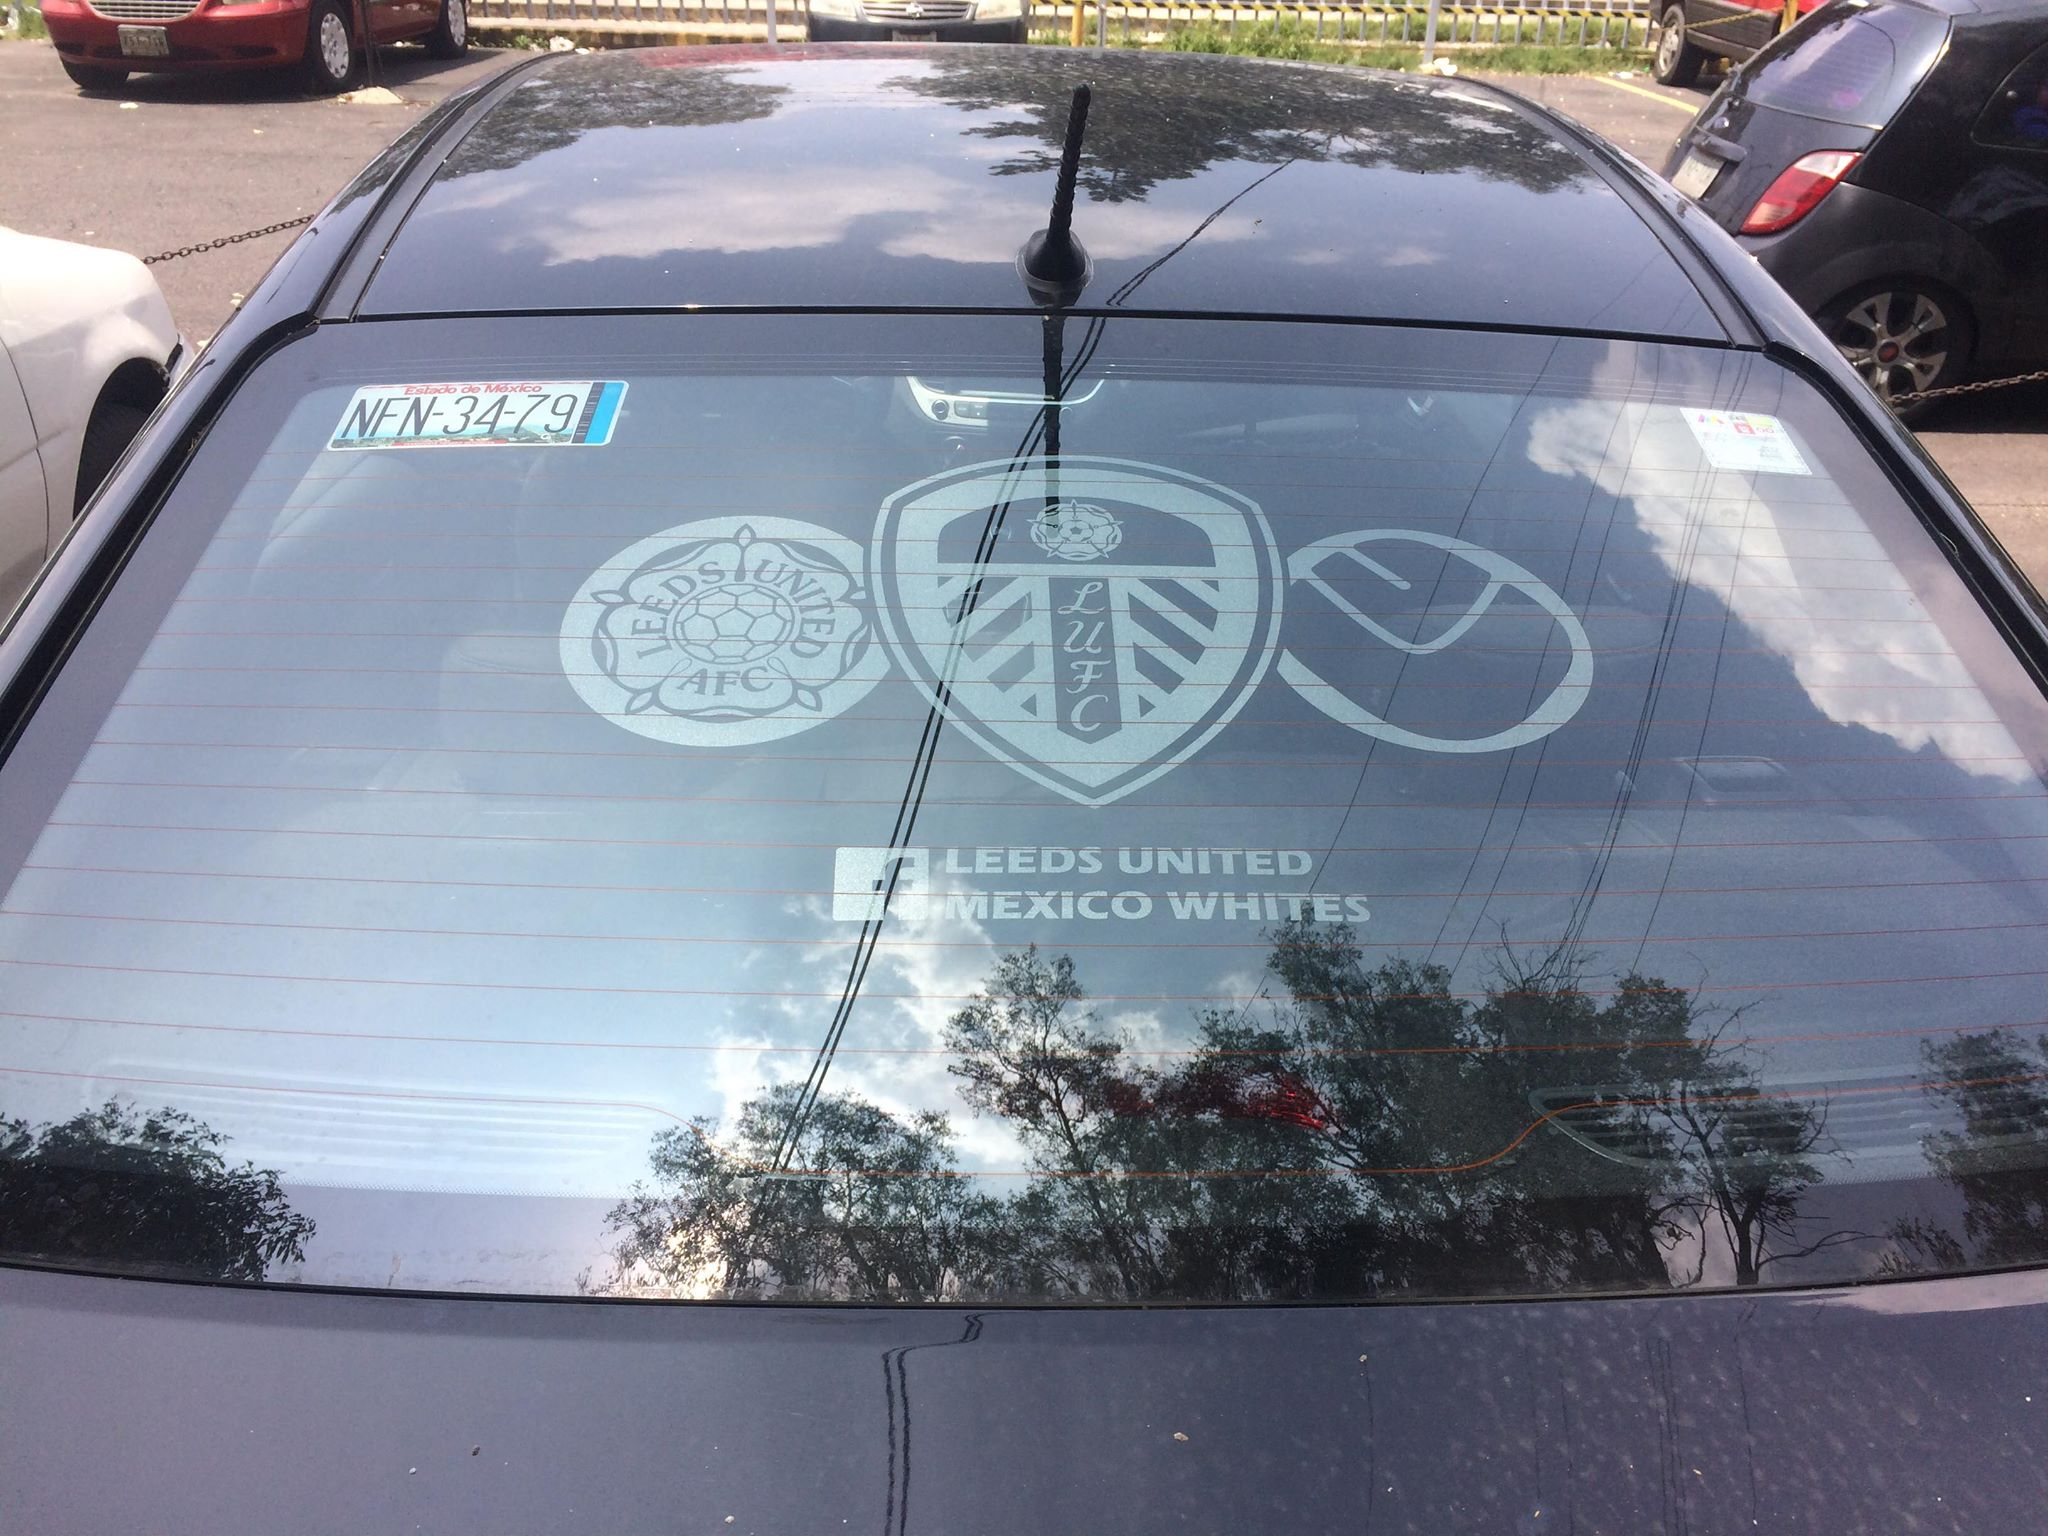 Leeds United window graphic